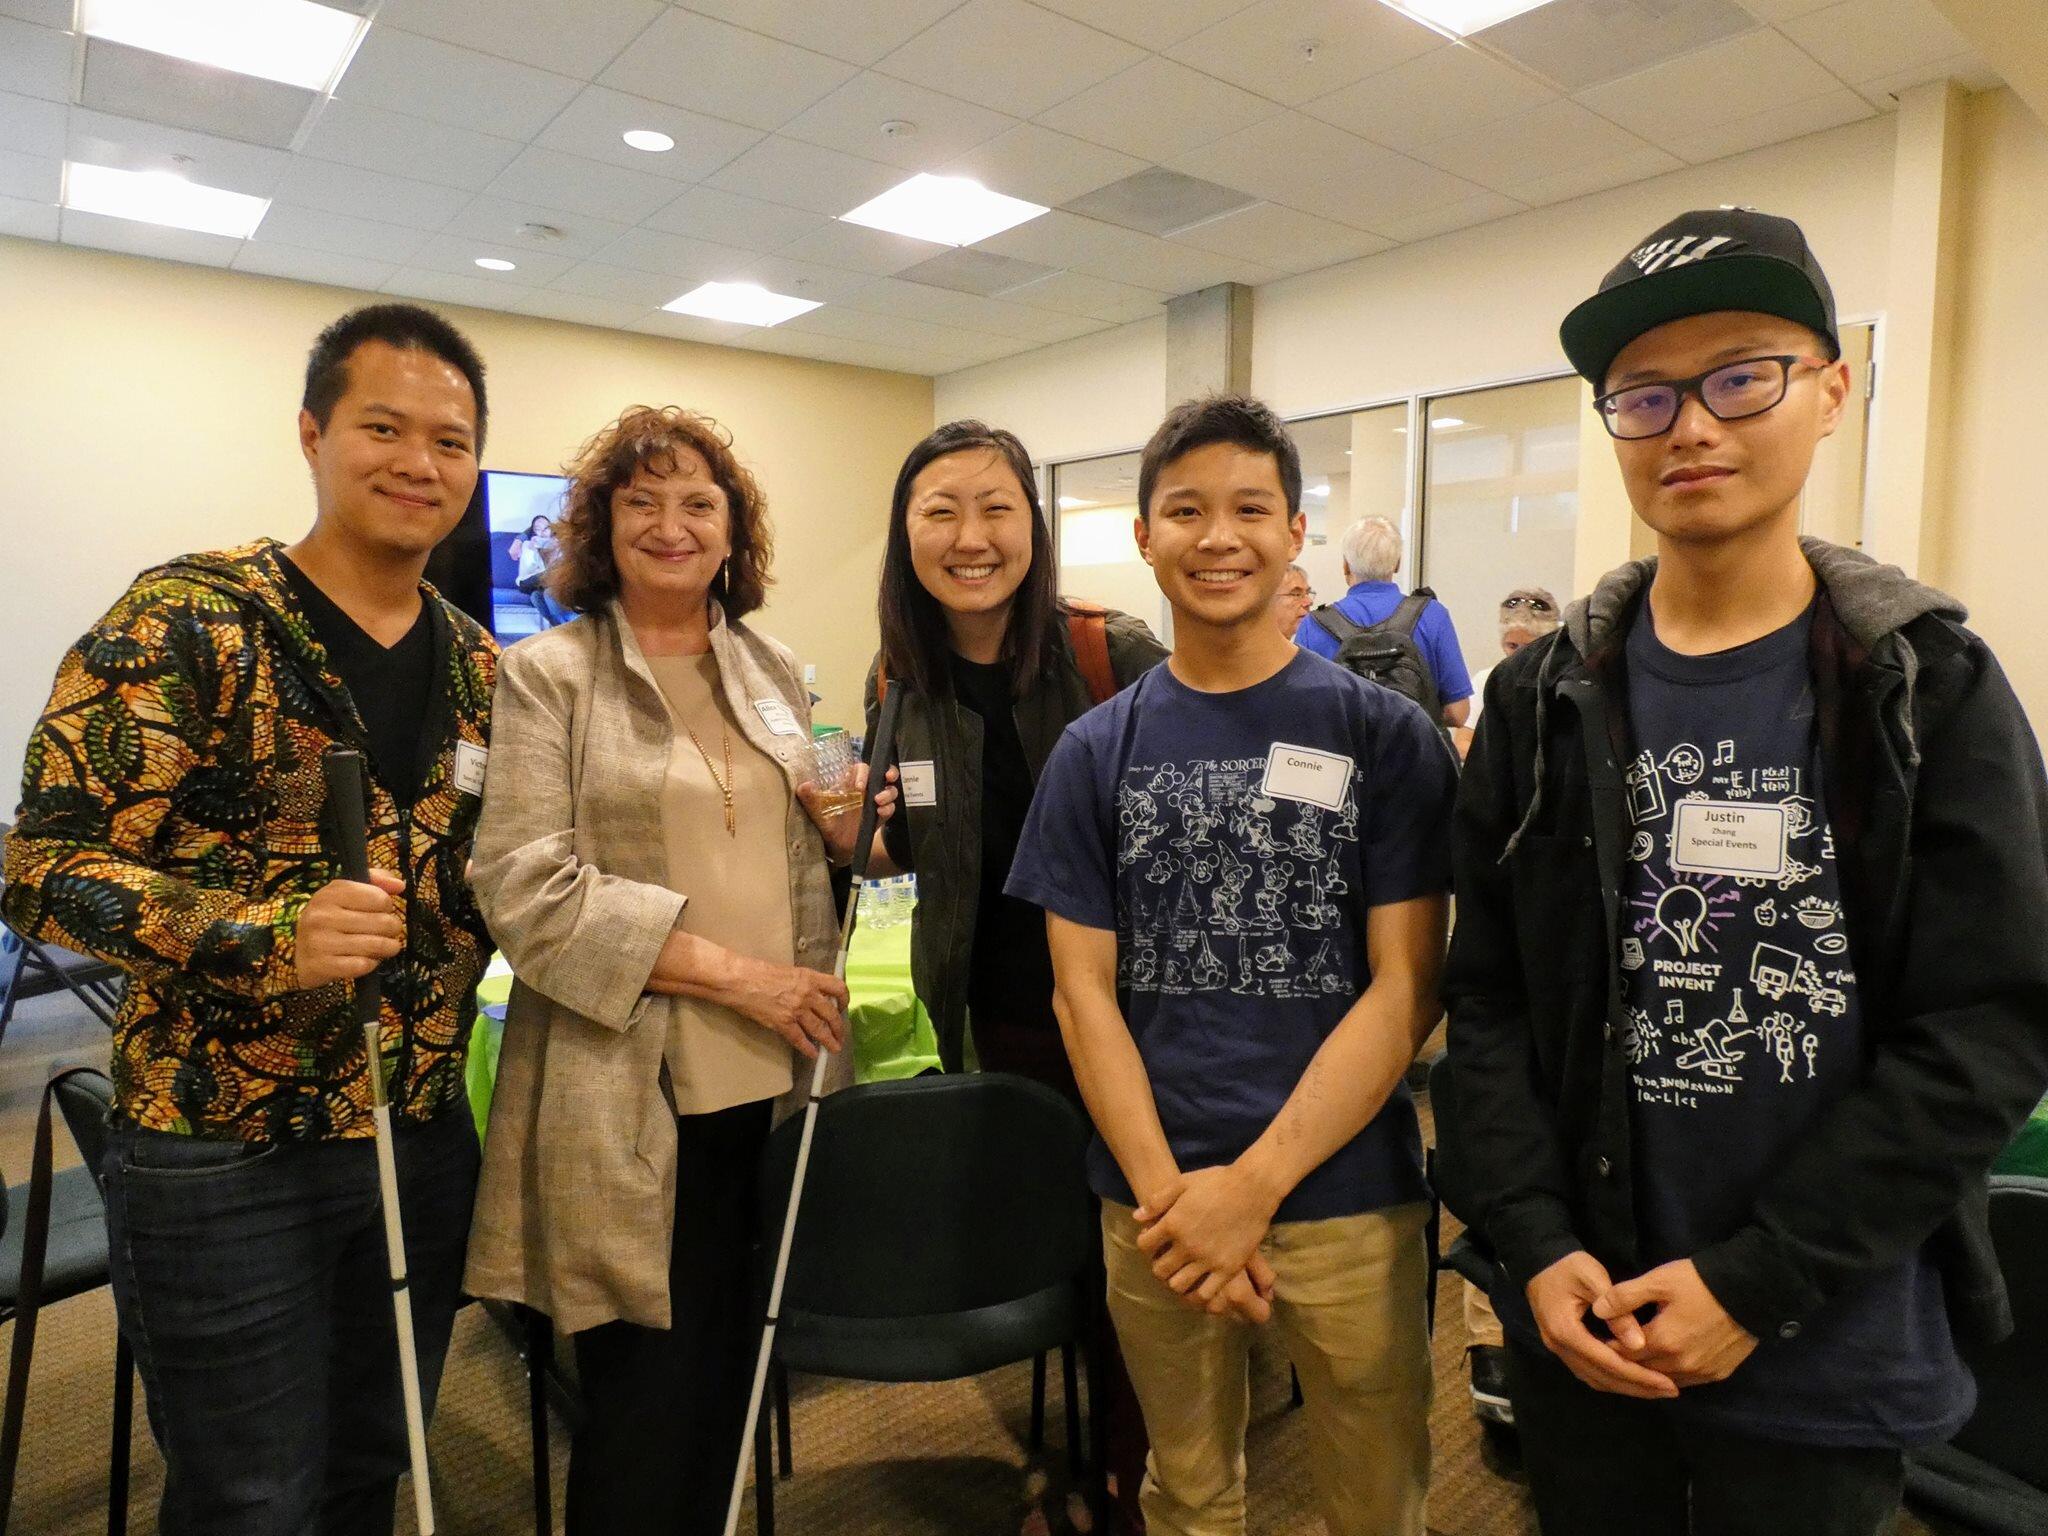 Vista Center for the Blind & Visually Impaired -